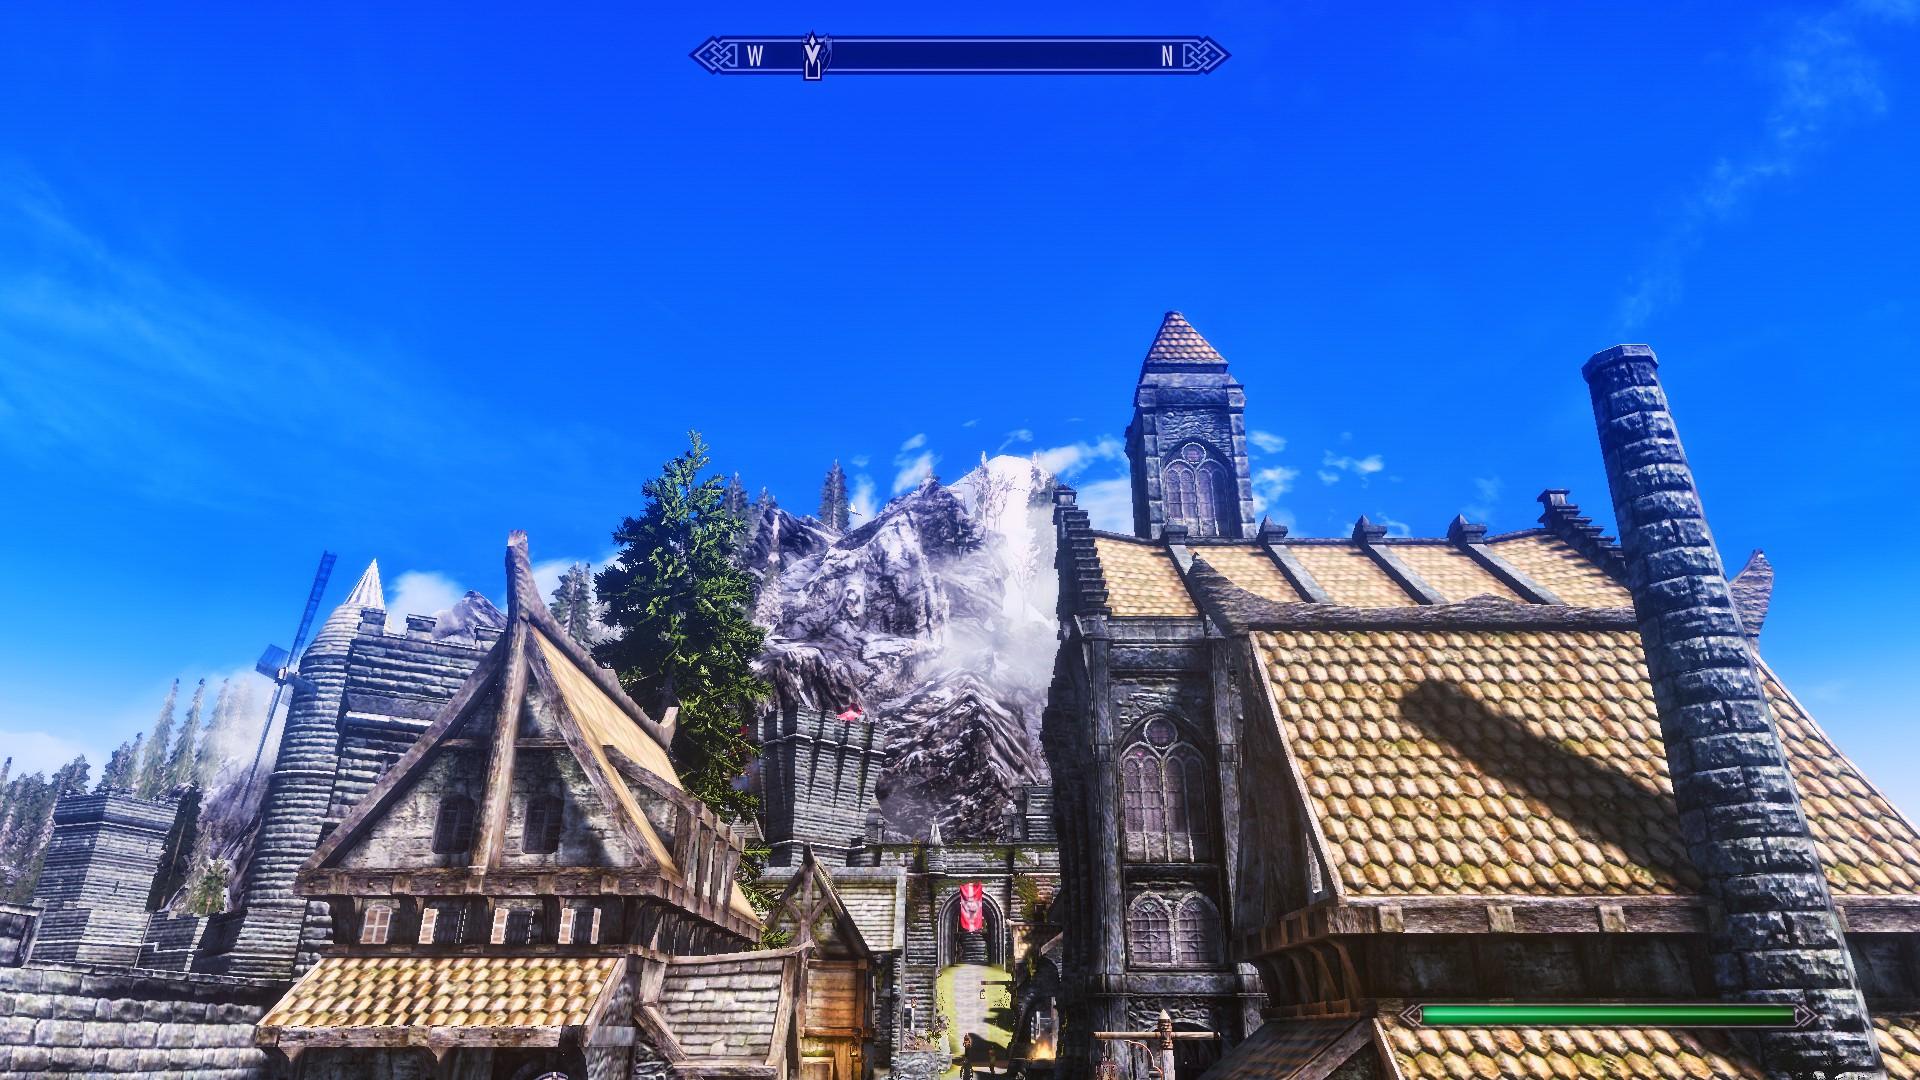 20180311220322_1.jpg - Elder Scrolls 5: Skyrim, the